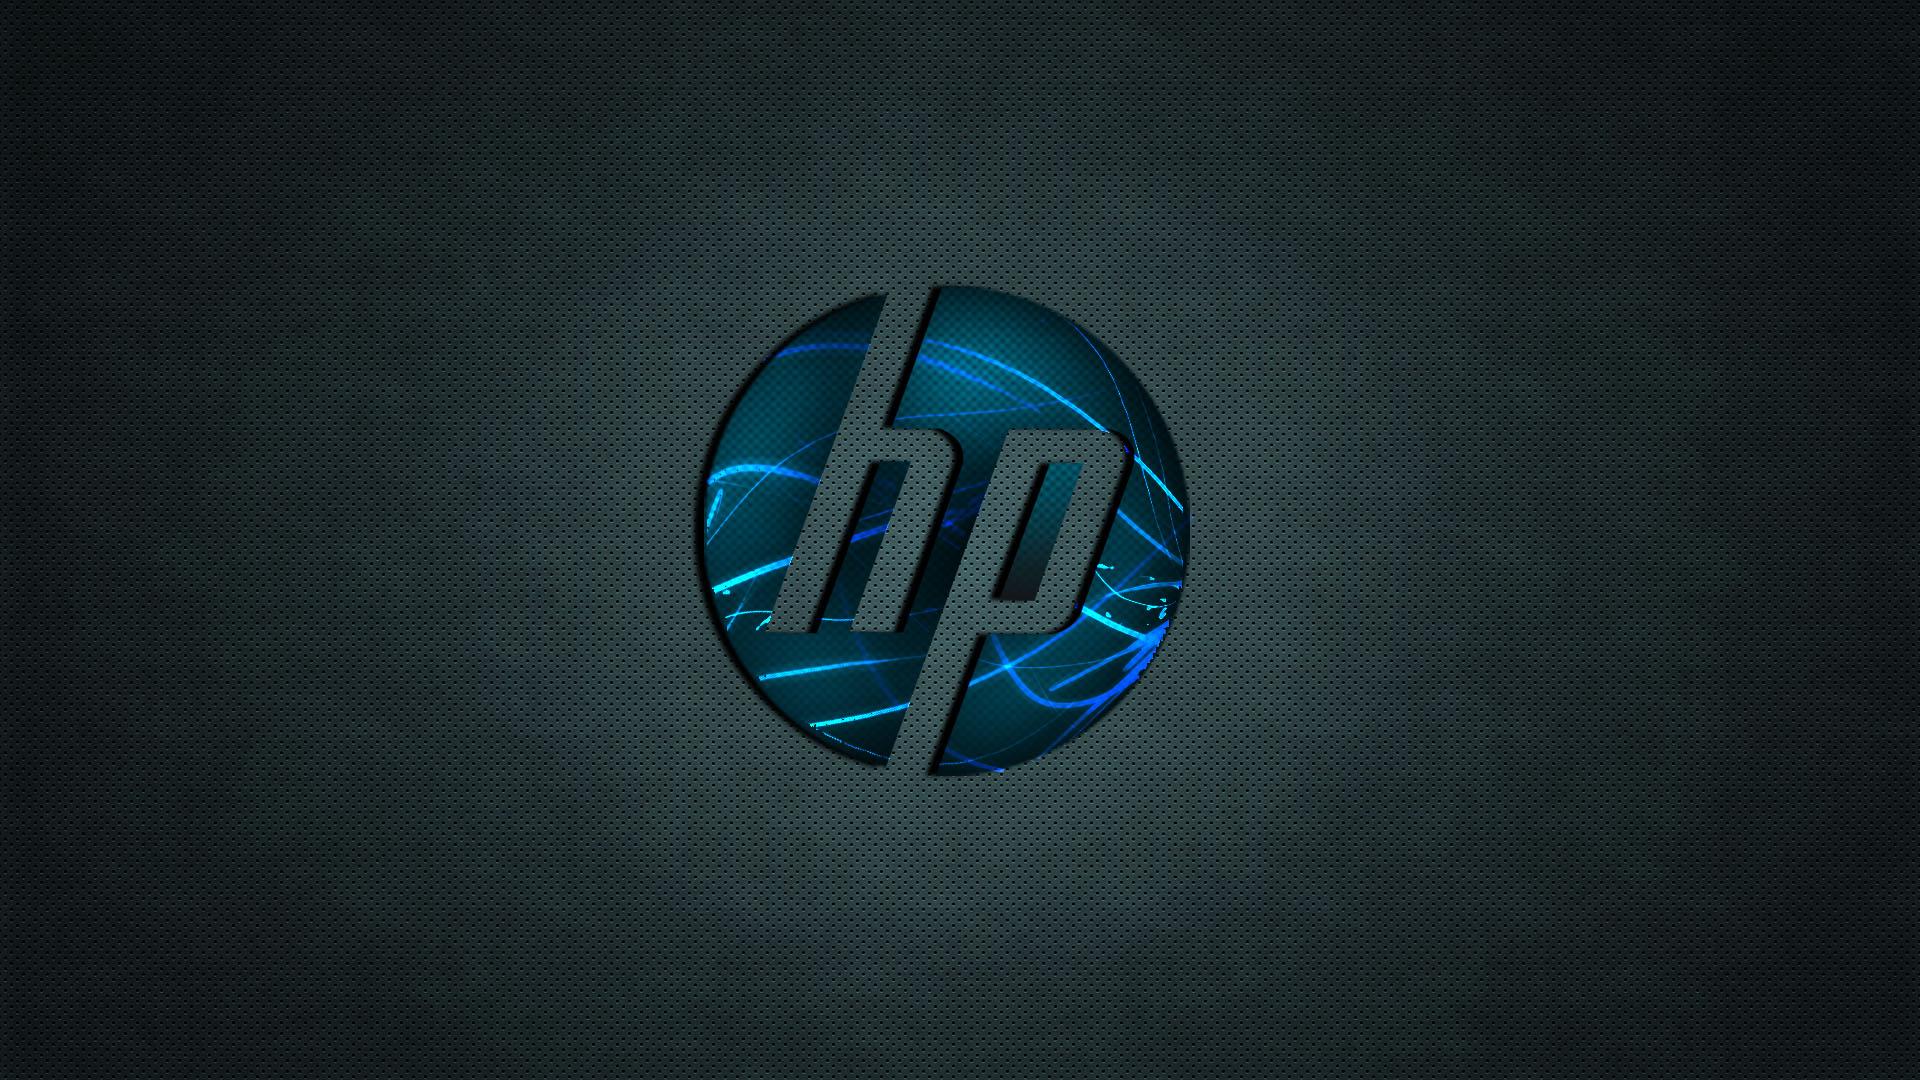 hp screensavers and wallpaper